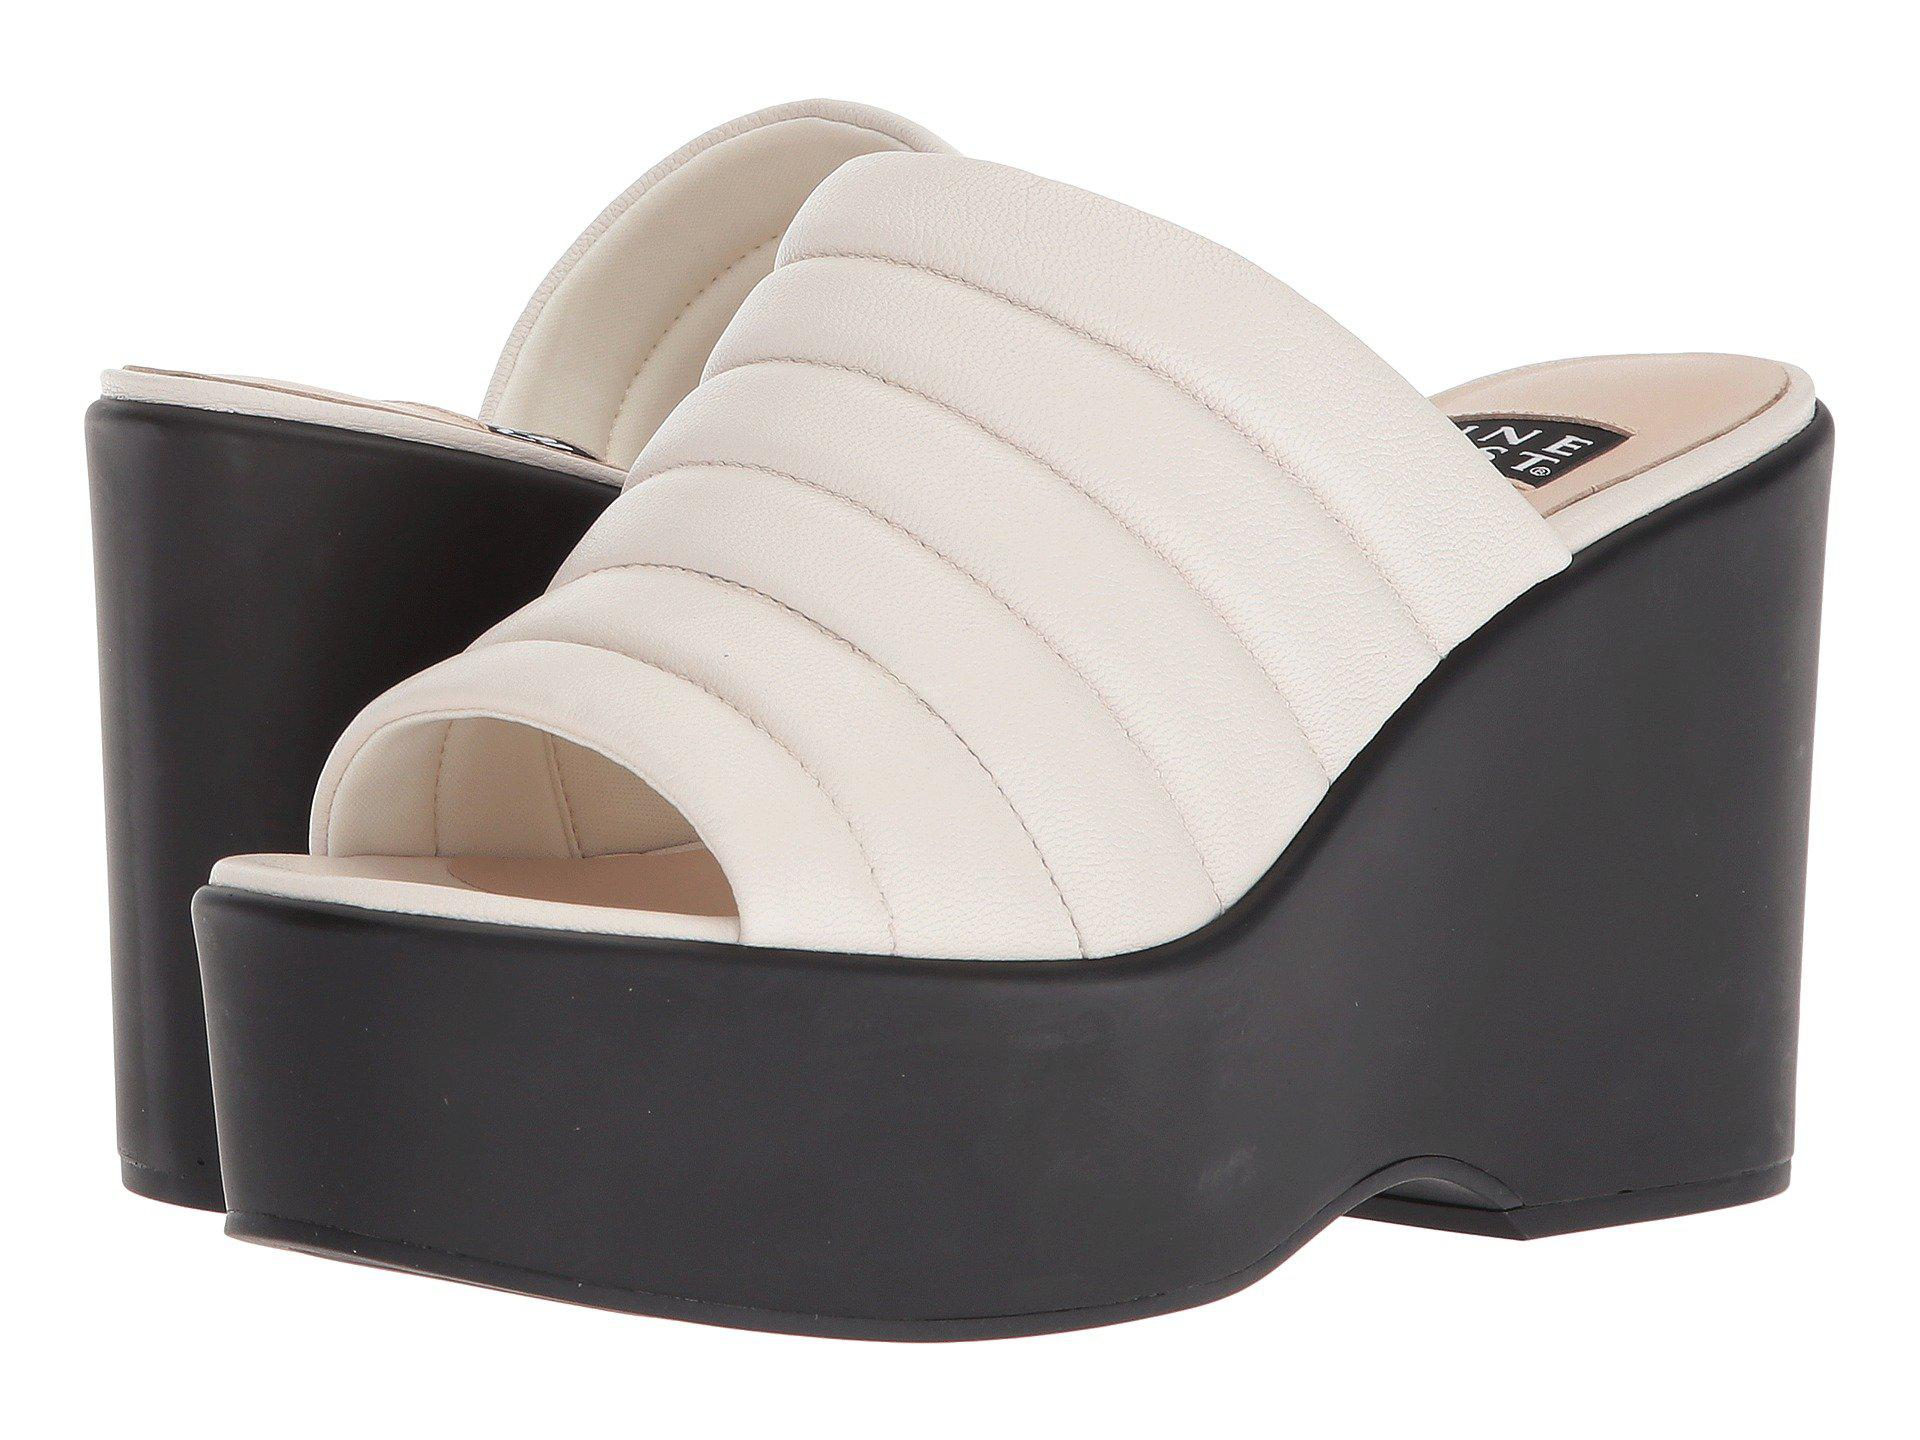 6d026721389c Lyst - Nine West Millie 40th Anniversary Platform Slide Sandal